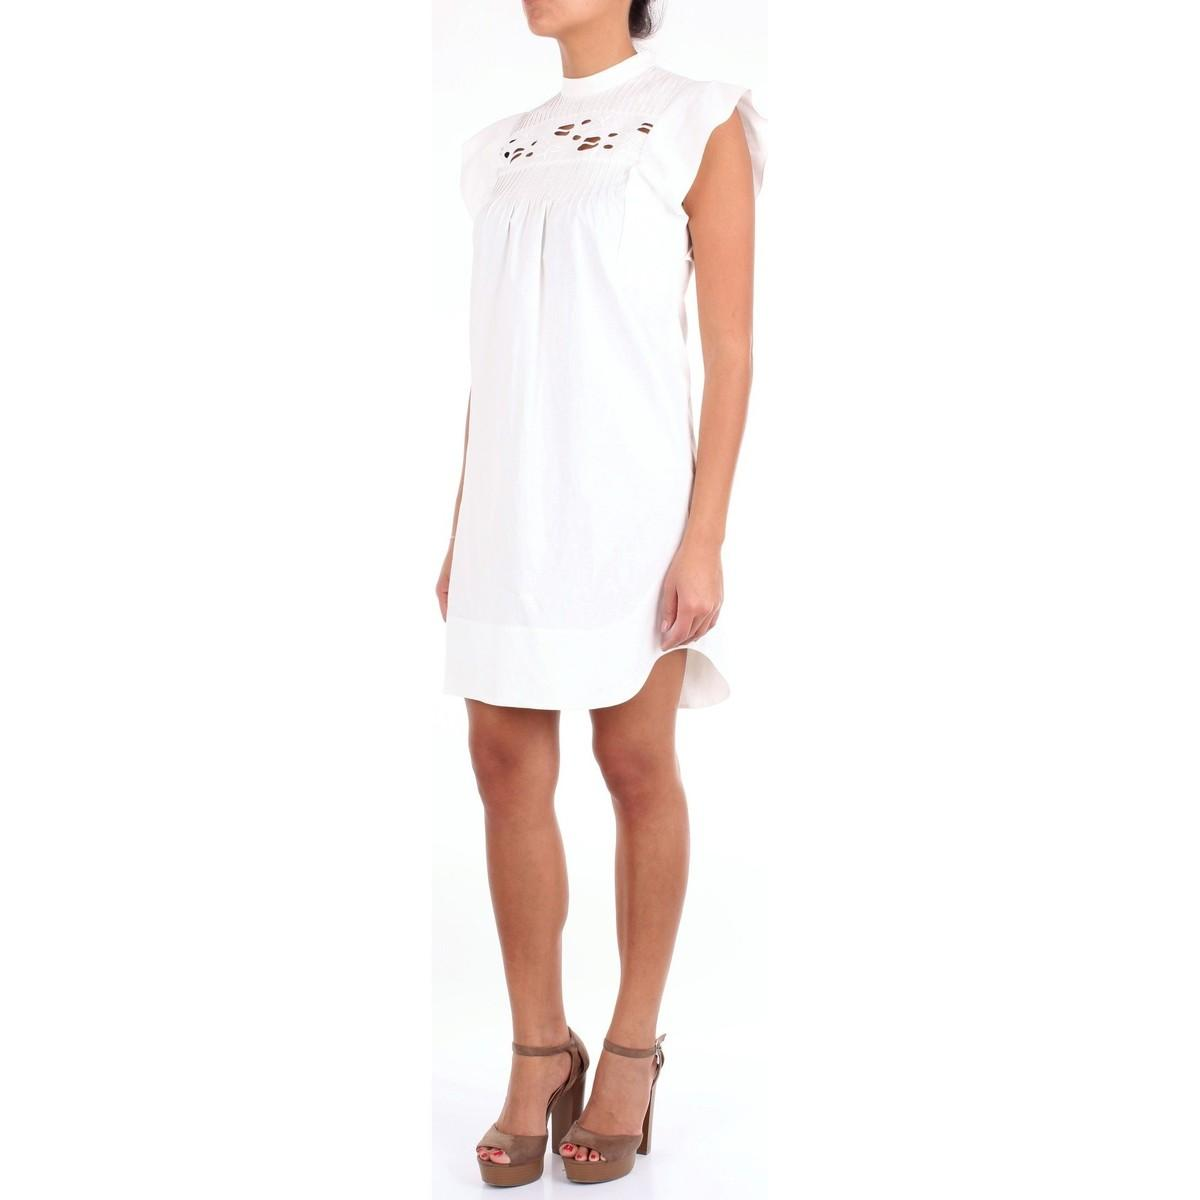 CHC18URO30043 Robe Chloé en coloris Blanc